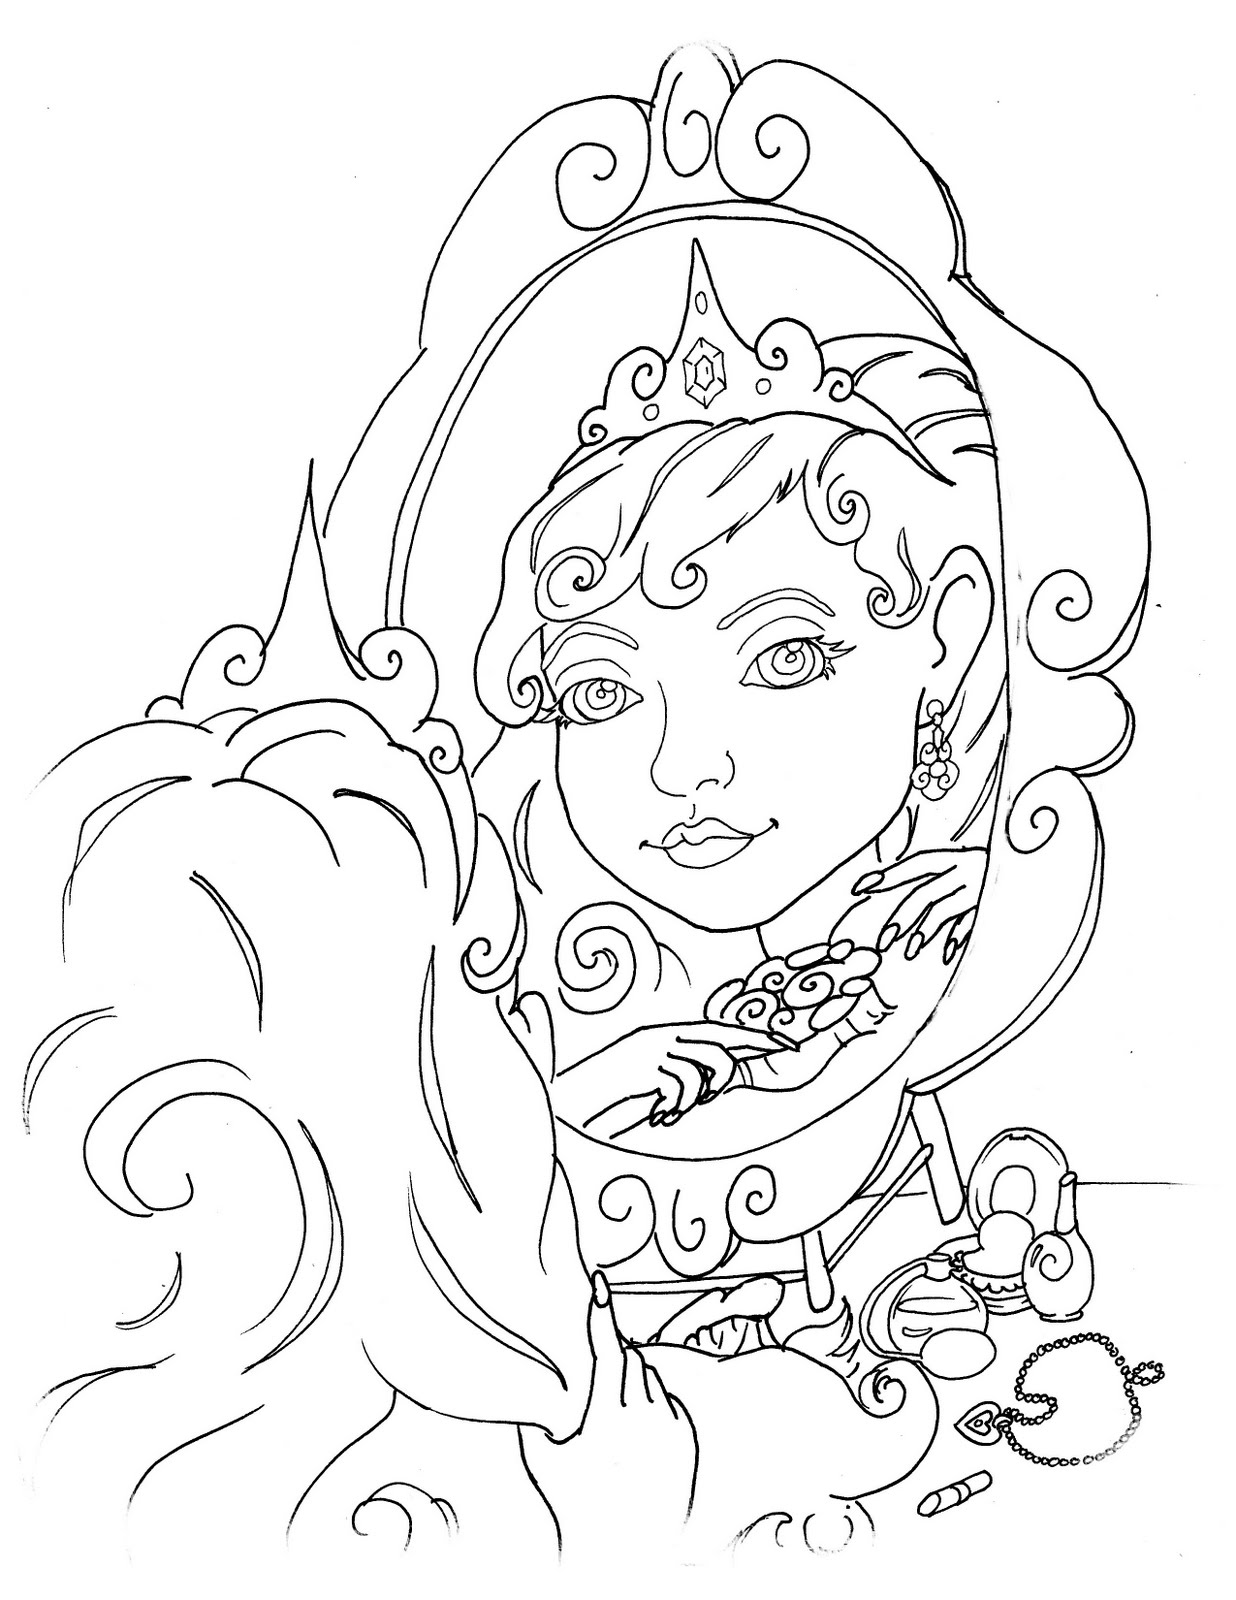 Pearson Illustration Princess Coloring Book Princess Color Book